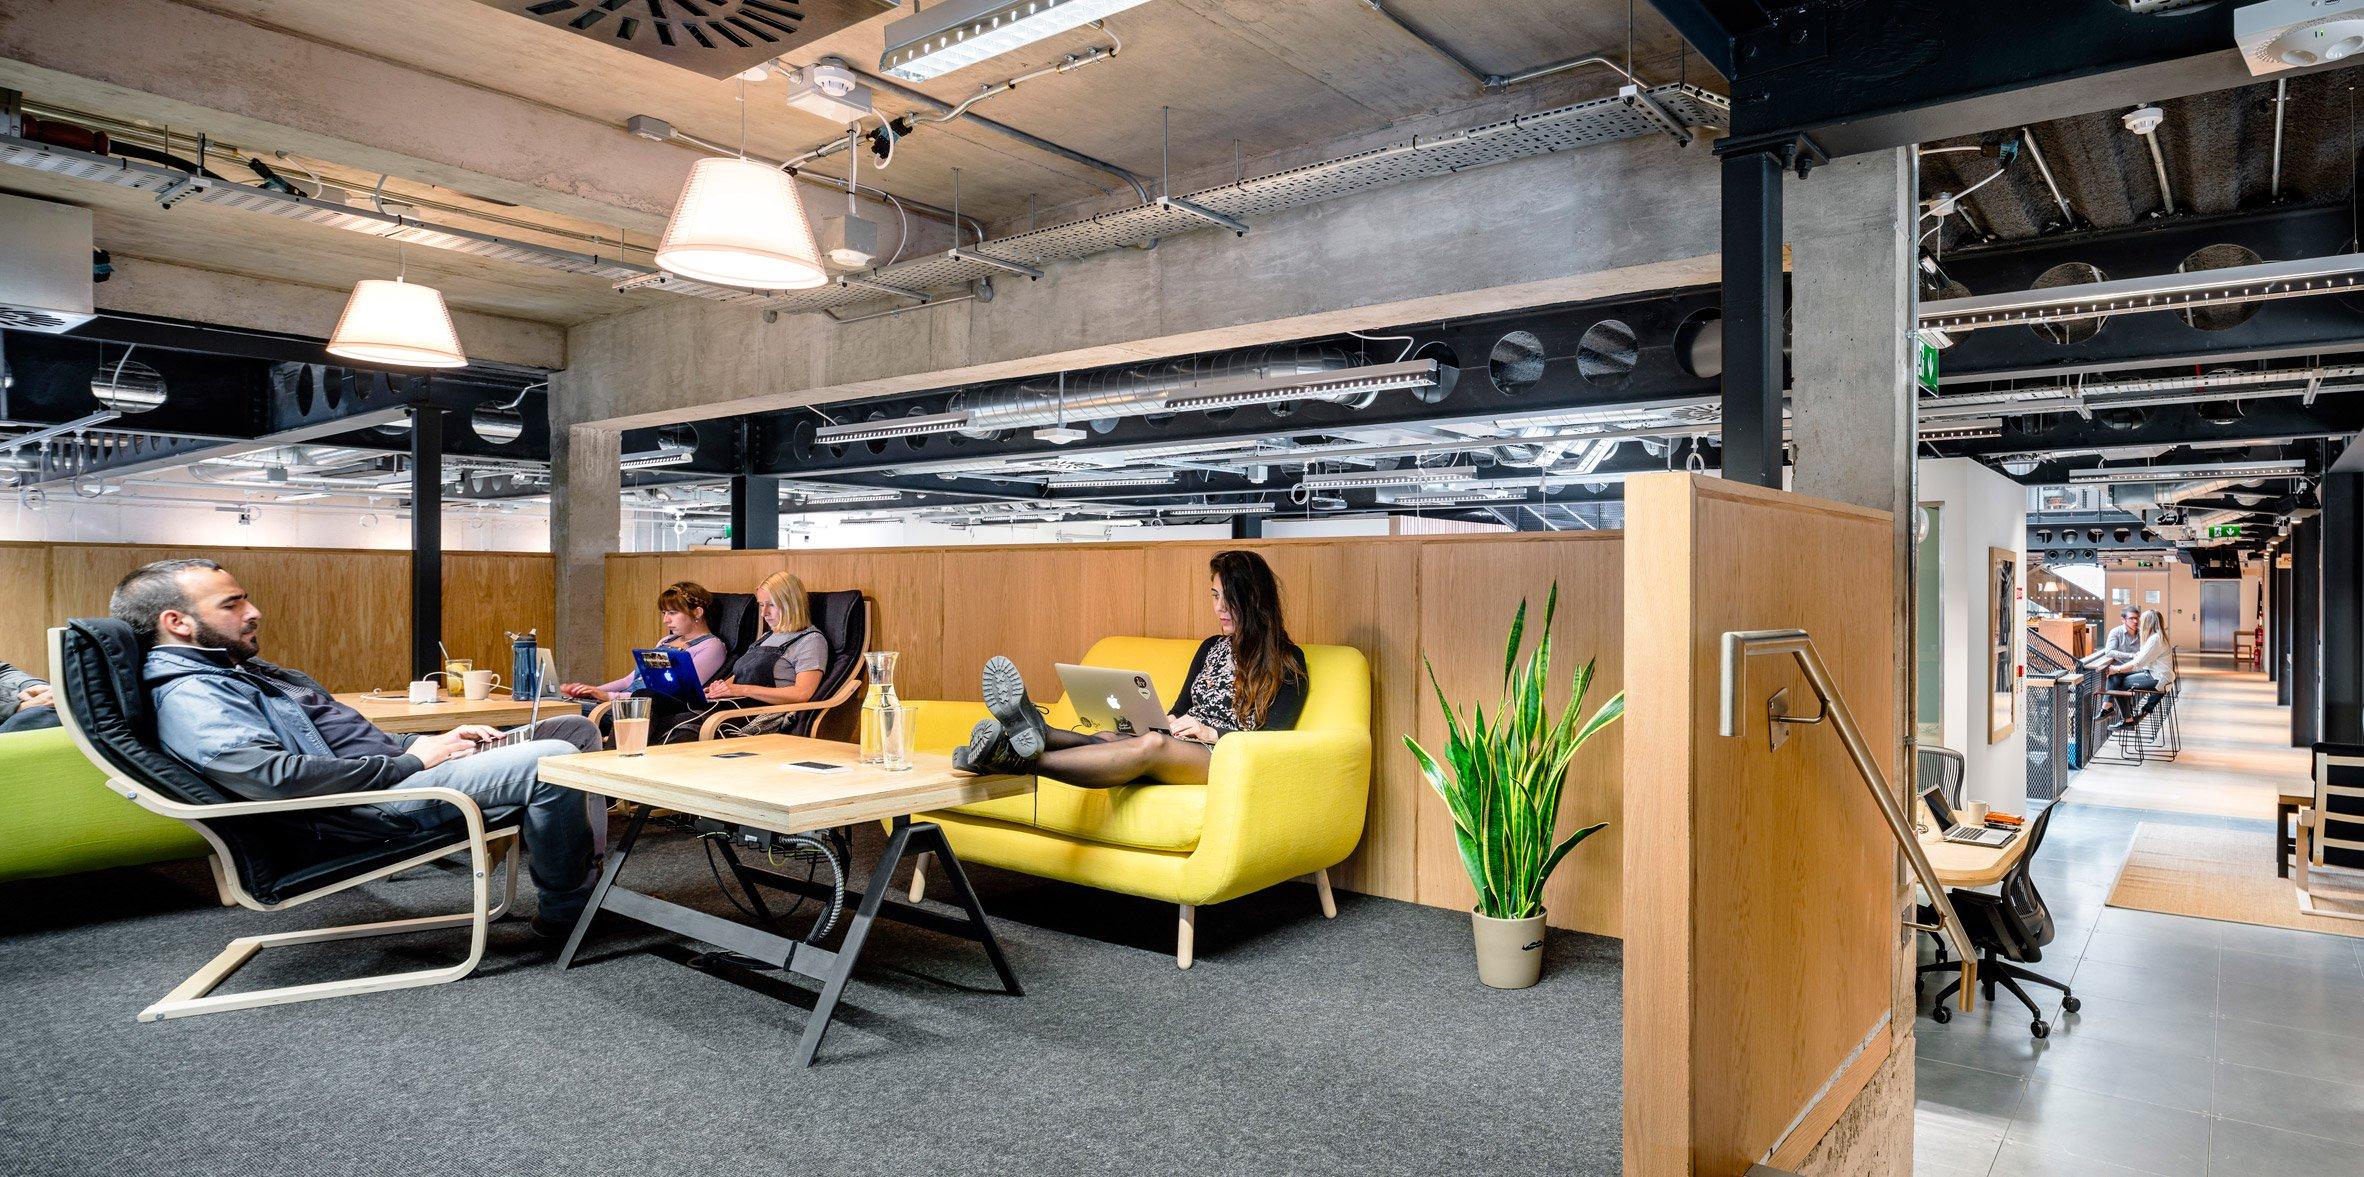 airbnb-dublin-office-interiors-ireland-offices_dezeen_2364_col_4